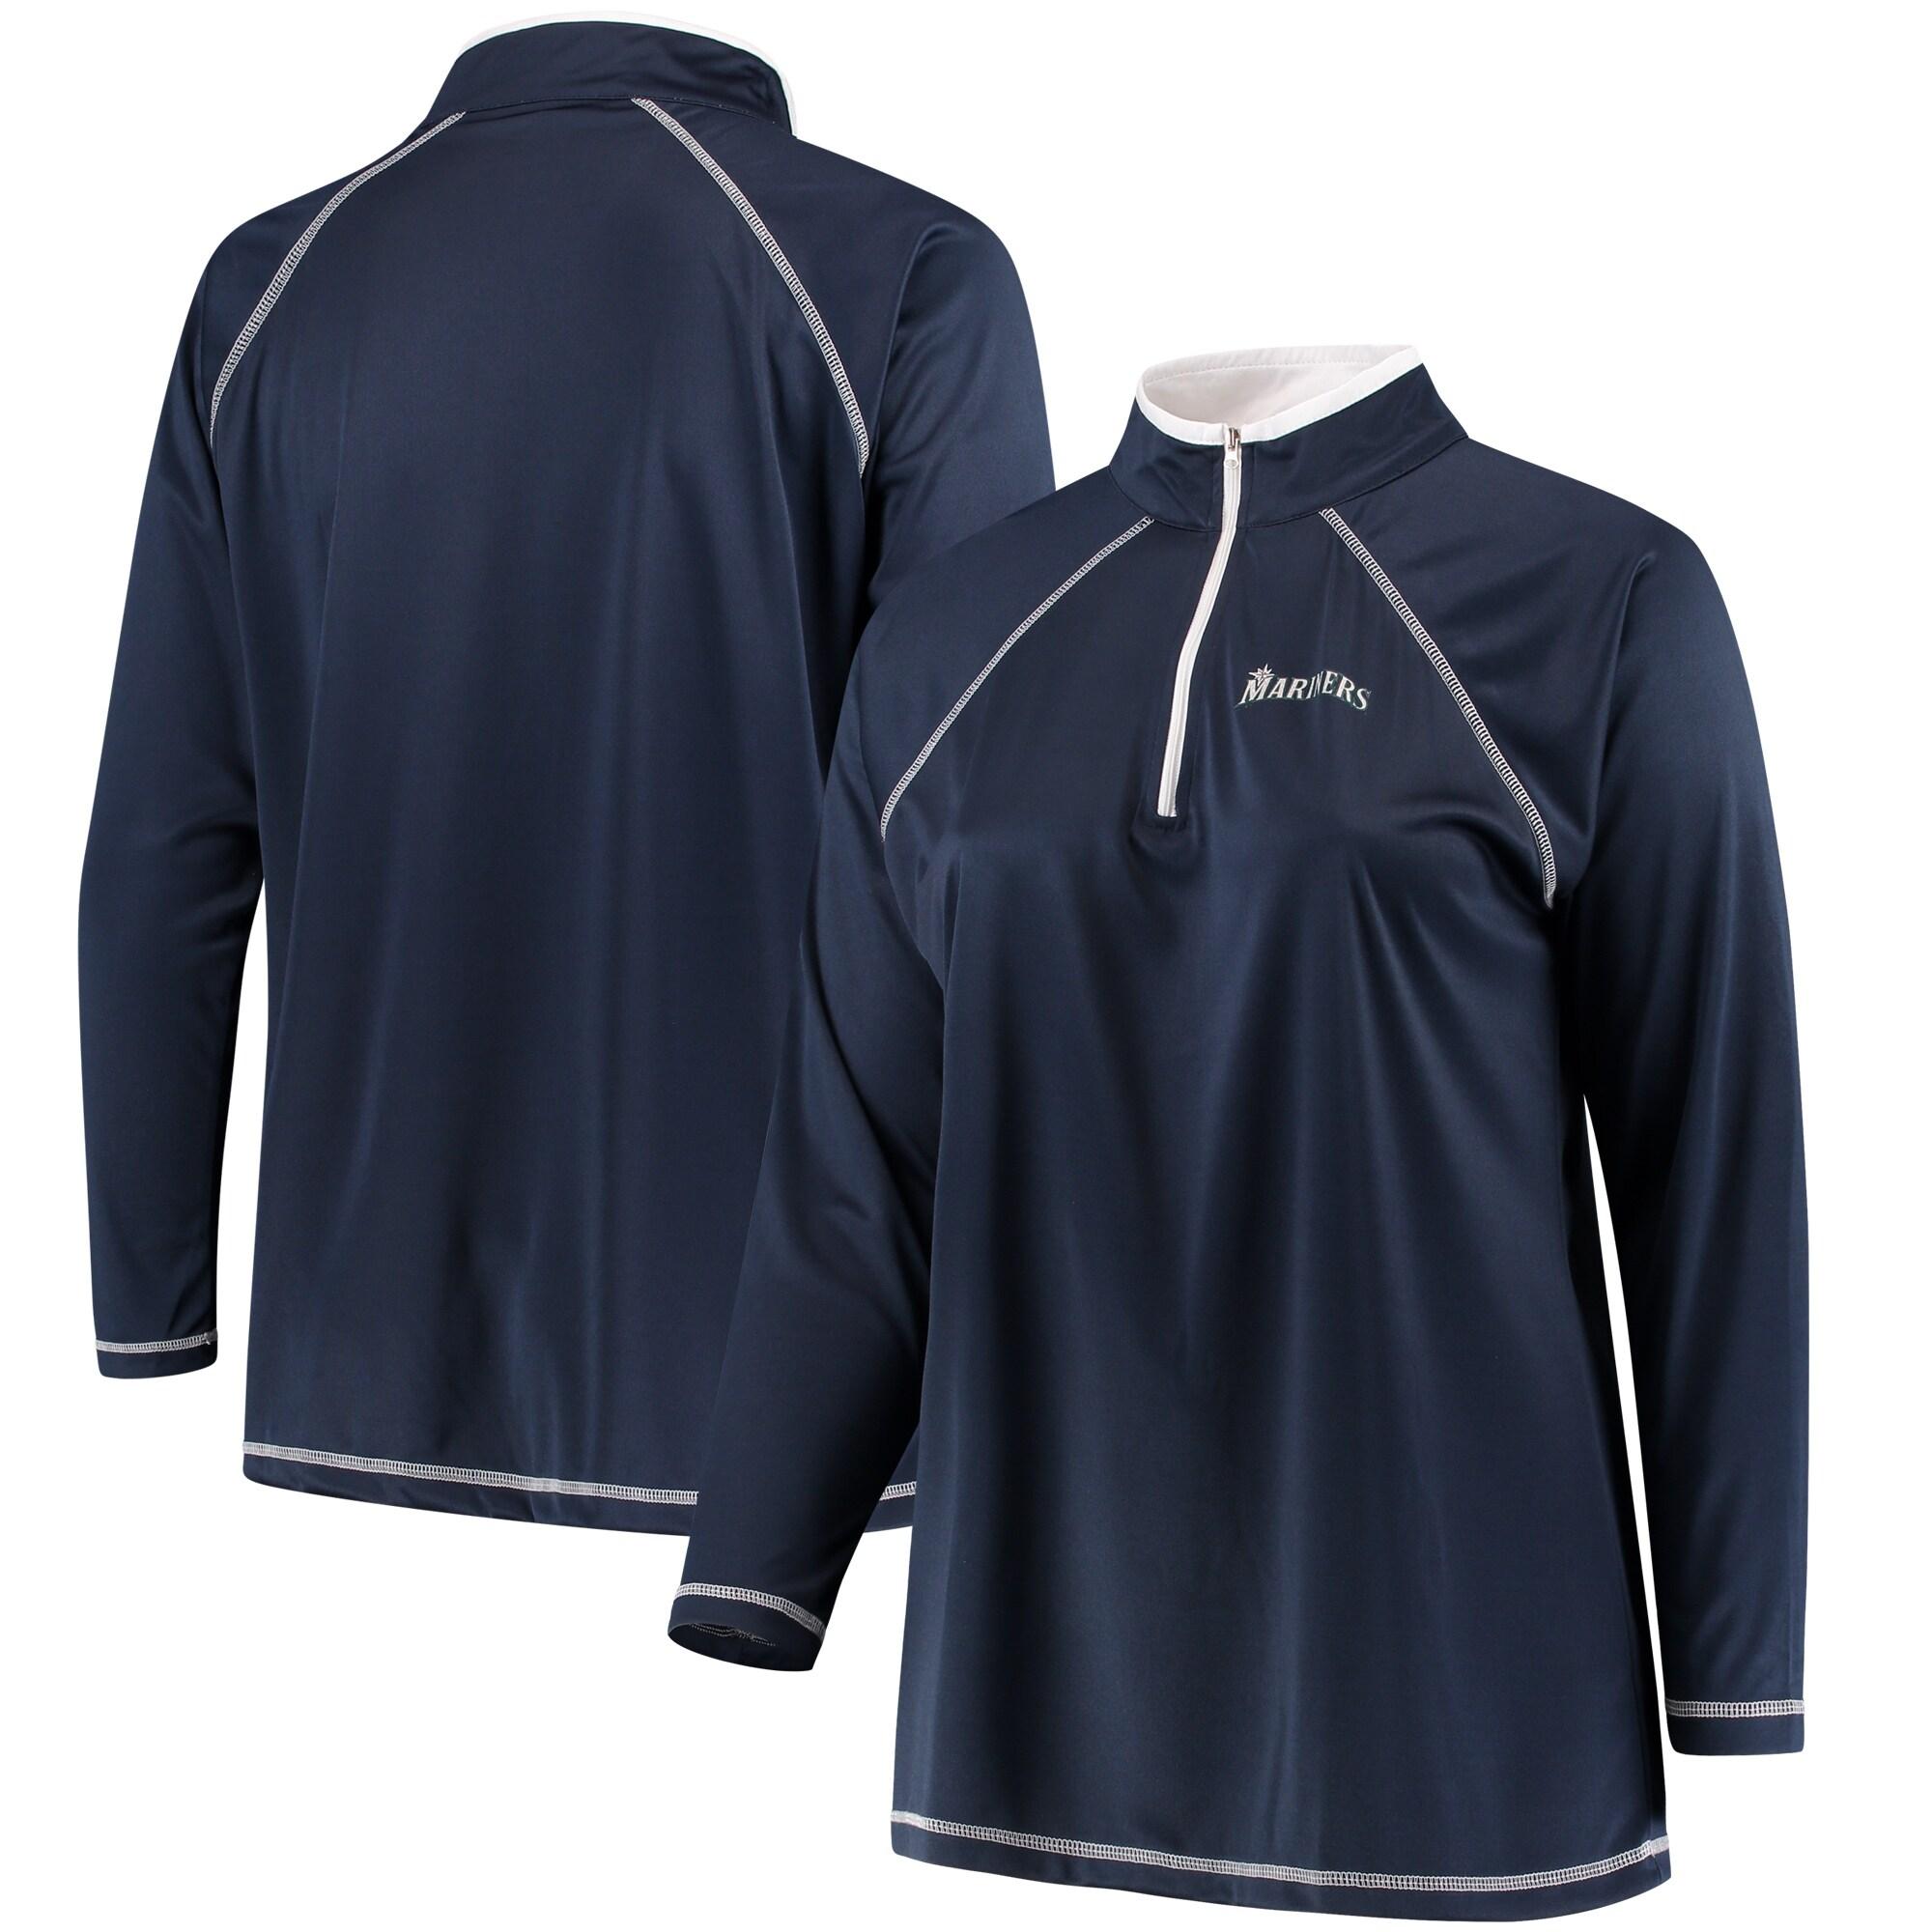 Seattle Mariners Majestic Women's Plus Size Quarter-Zip Pullover Jacket - Navy